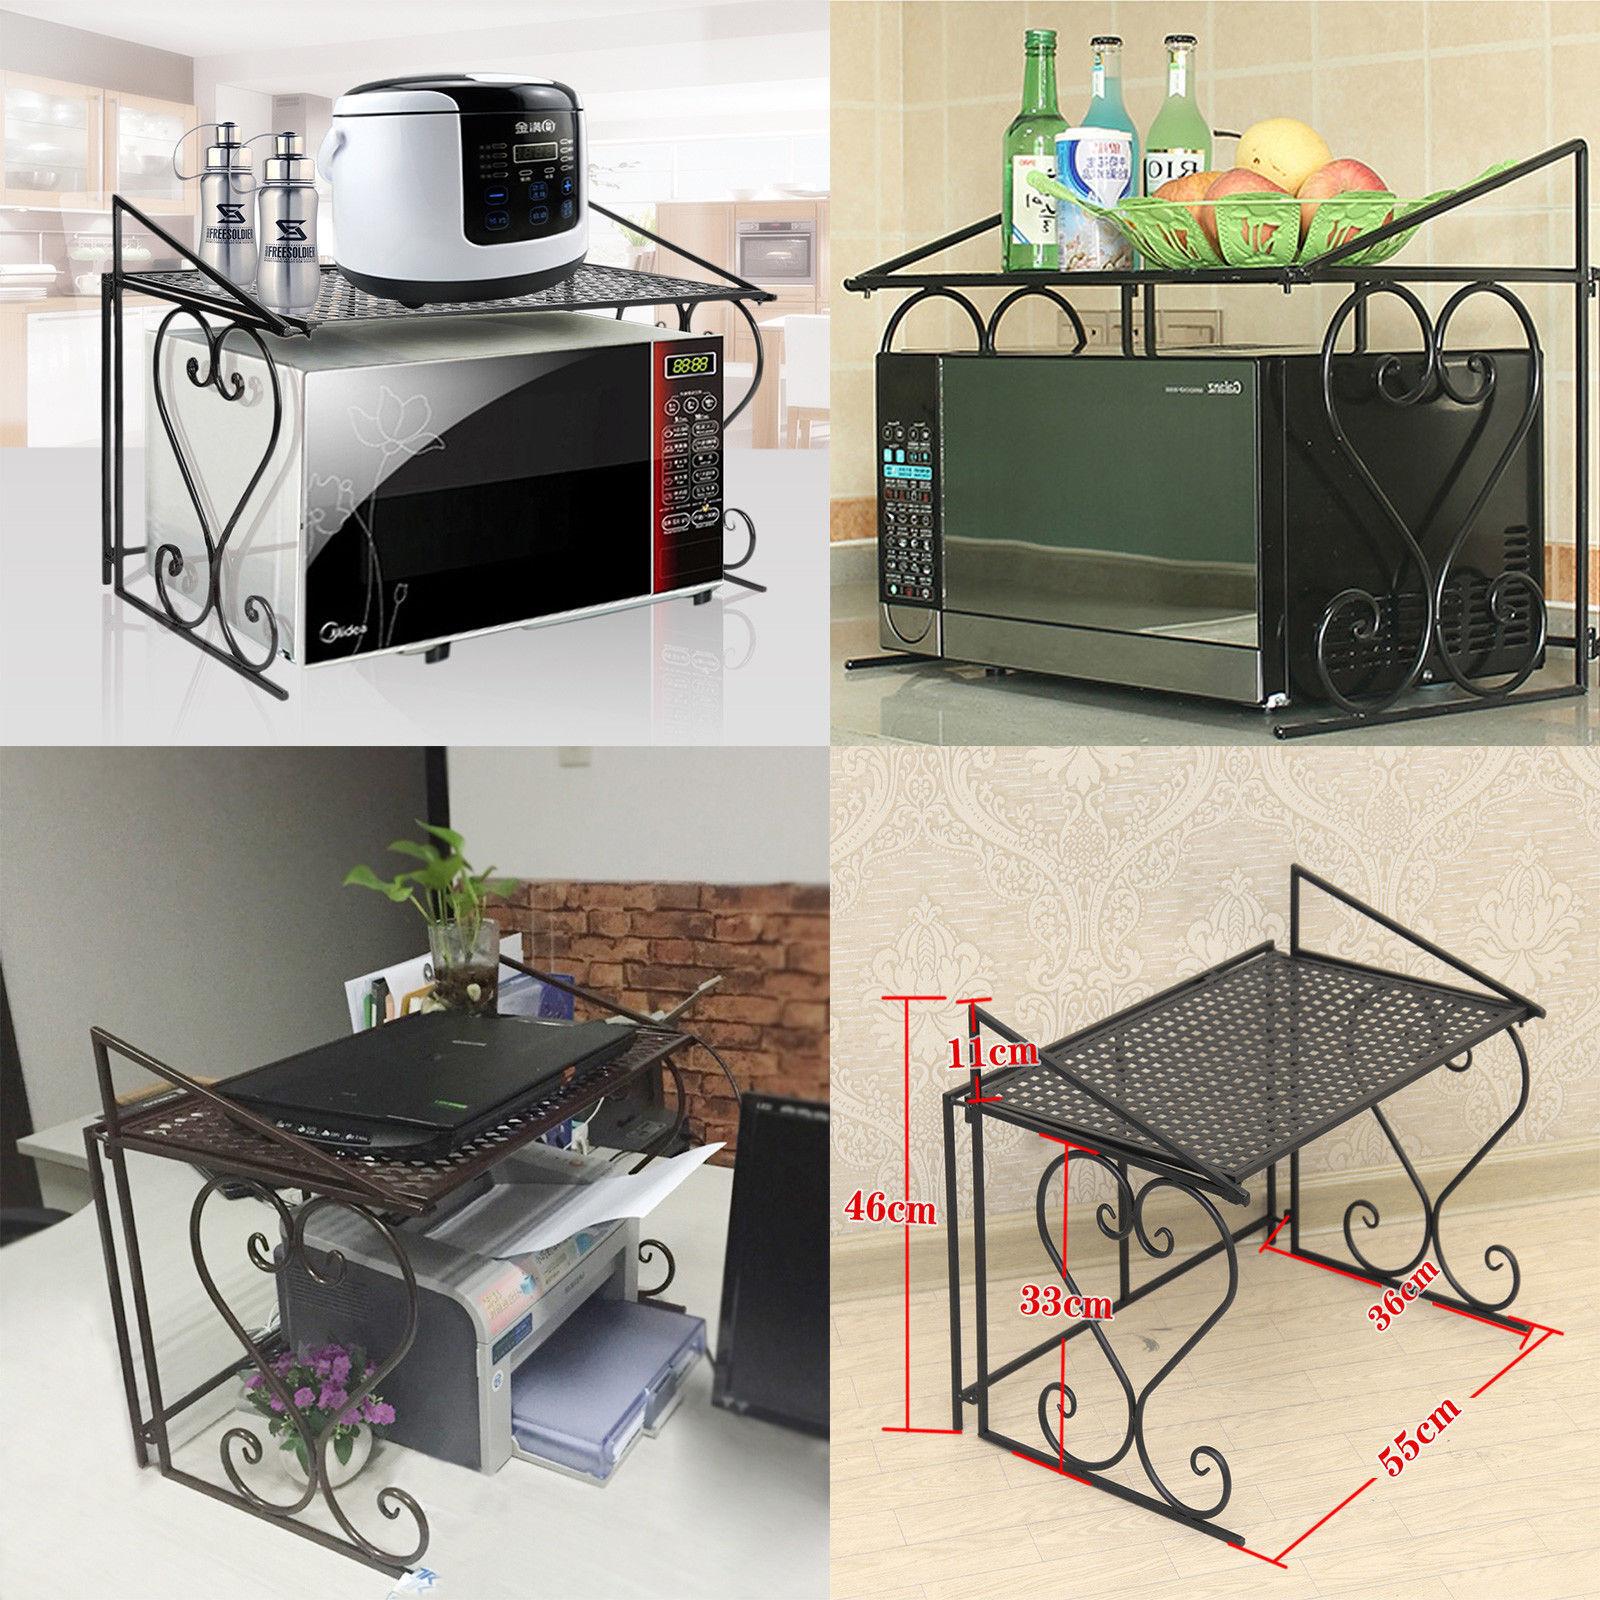 Microwave Oven Rack Kitchen Organizer Counter Cabinet Storage Metal Season Shelf